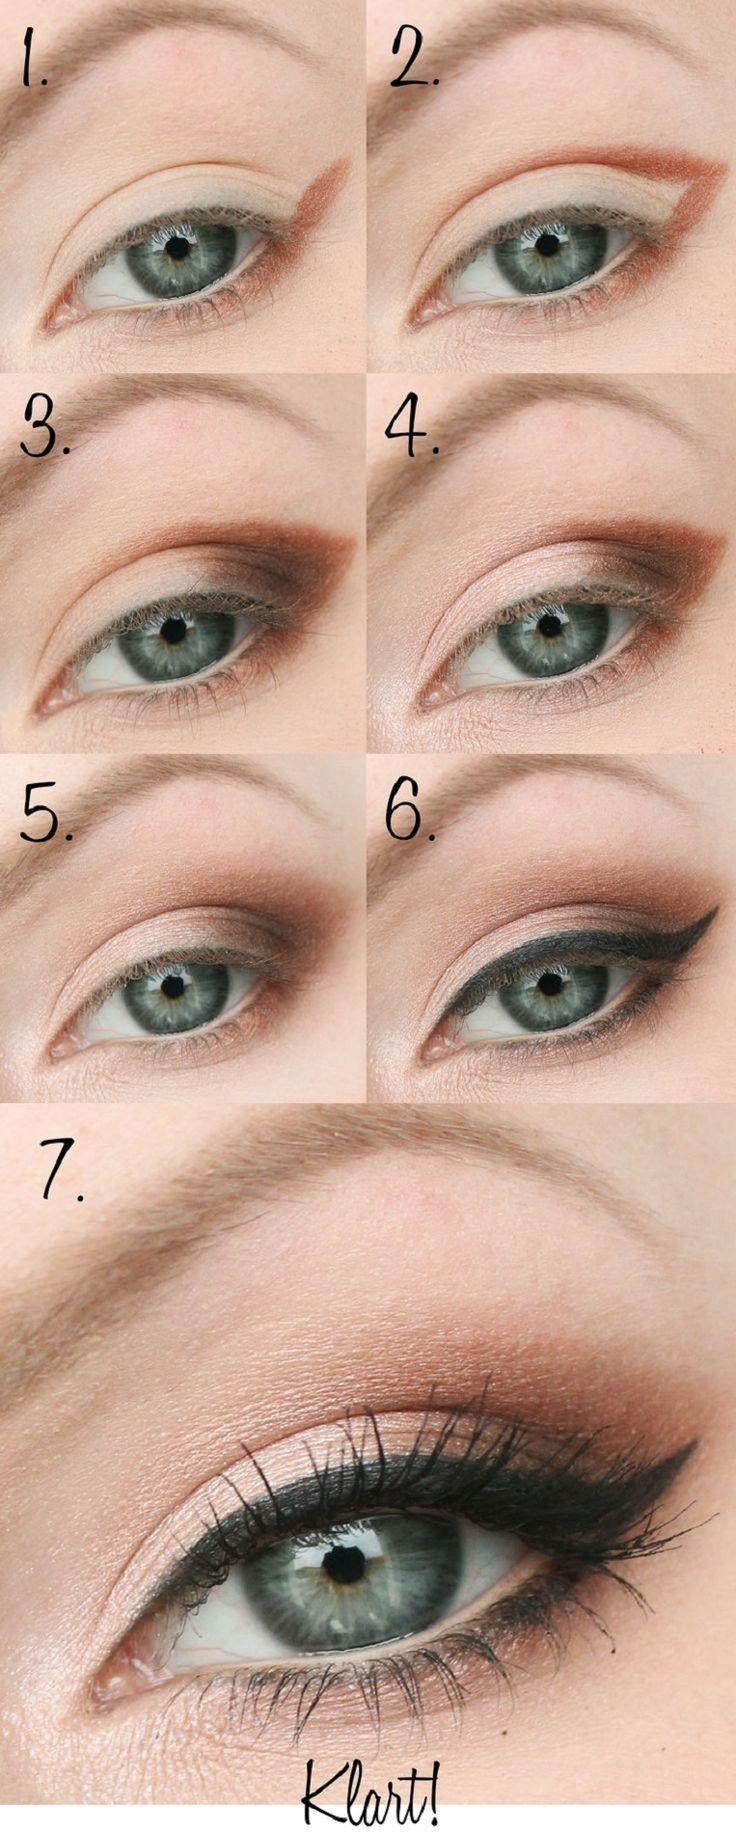 Maquillaje Ojos Mas Beauty Personal Care Makeup Eyes Eyeshadow Eye Makeup Http Amz Brown Eye Makeup Tutorial Gold And Brown Eye Makeup Eye Makeup